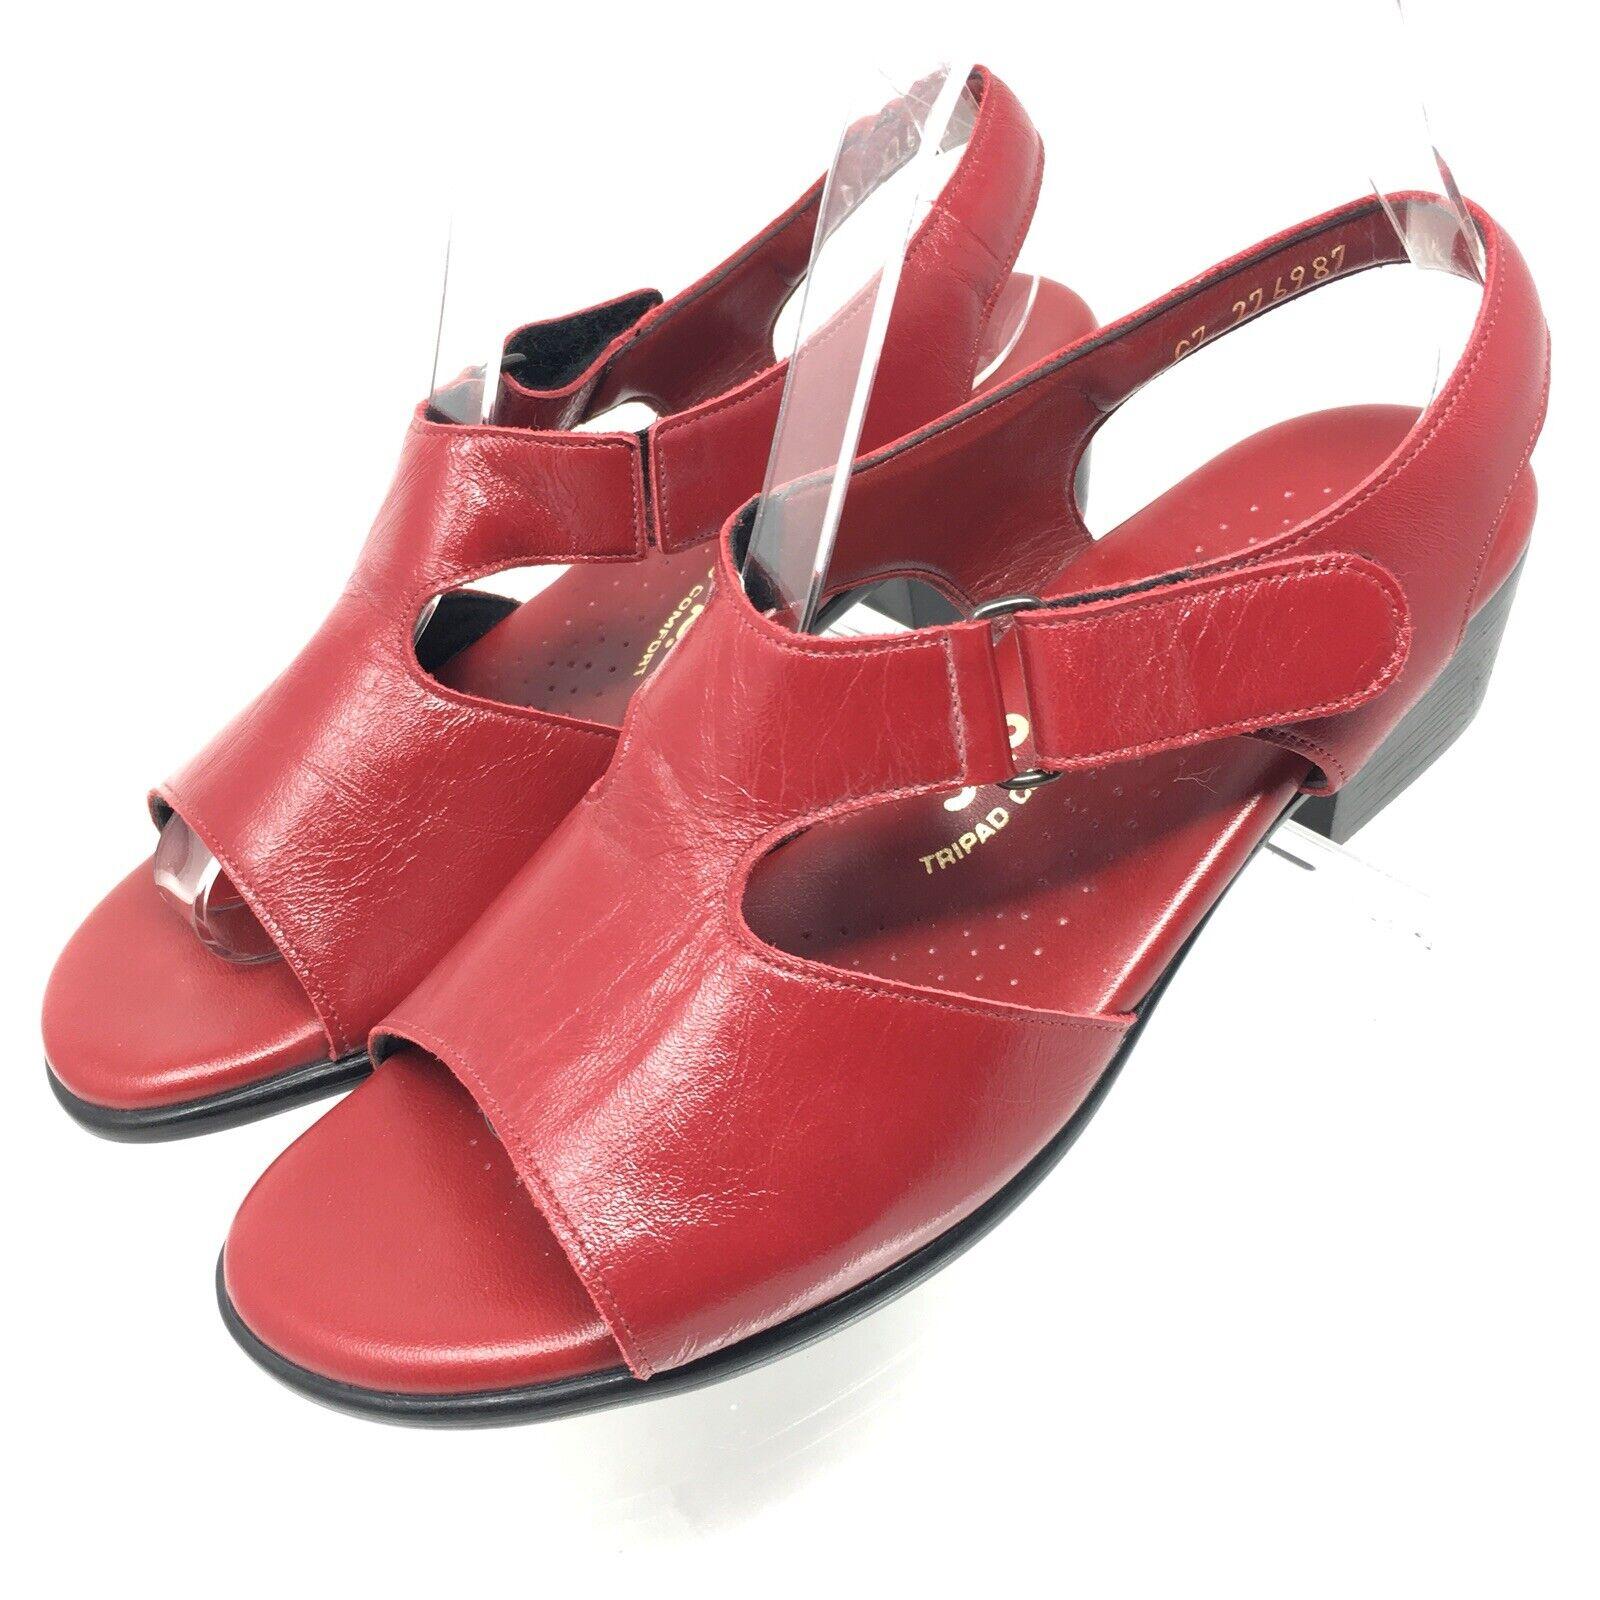 SAS Suntimer Womens Size 7.5W Red Leather Sandals SlingBack Tripad Comfort